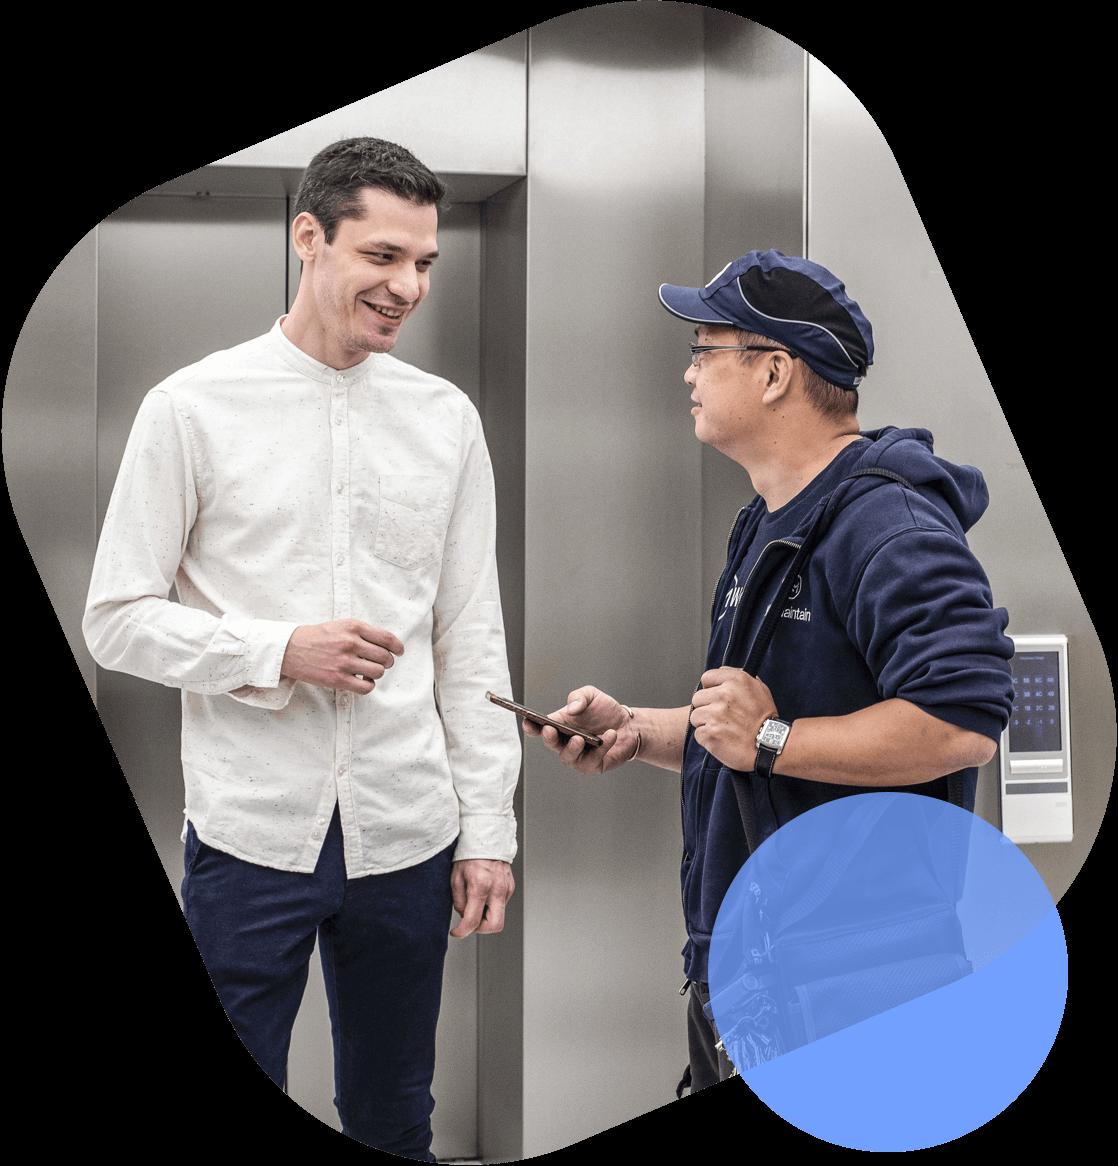 Ensure customer's satisfaction